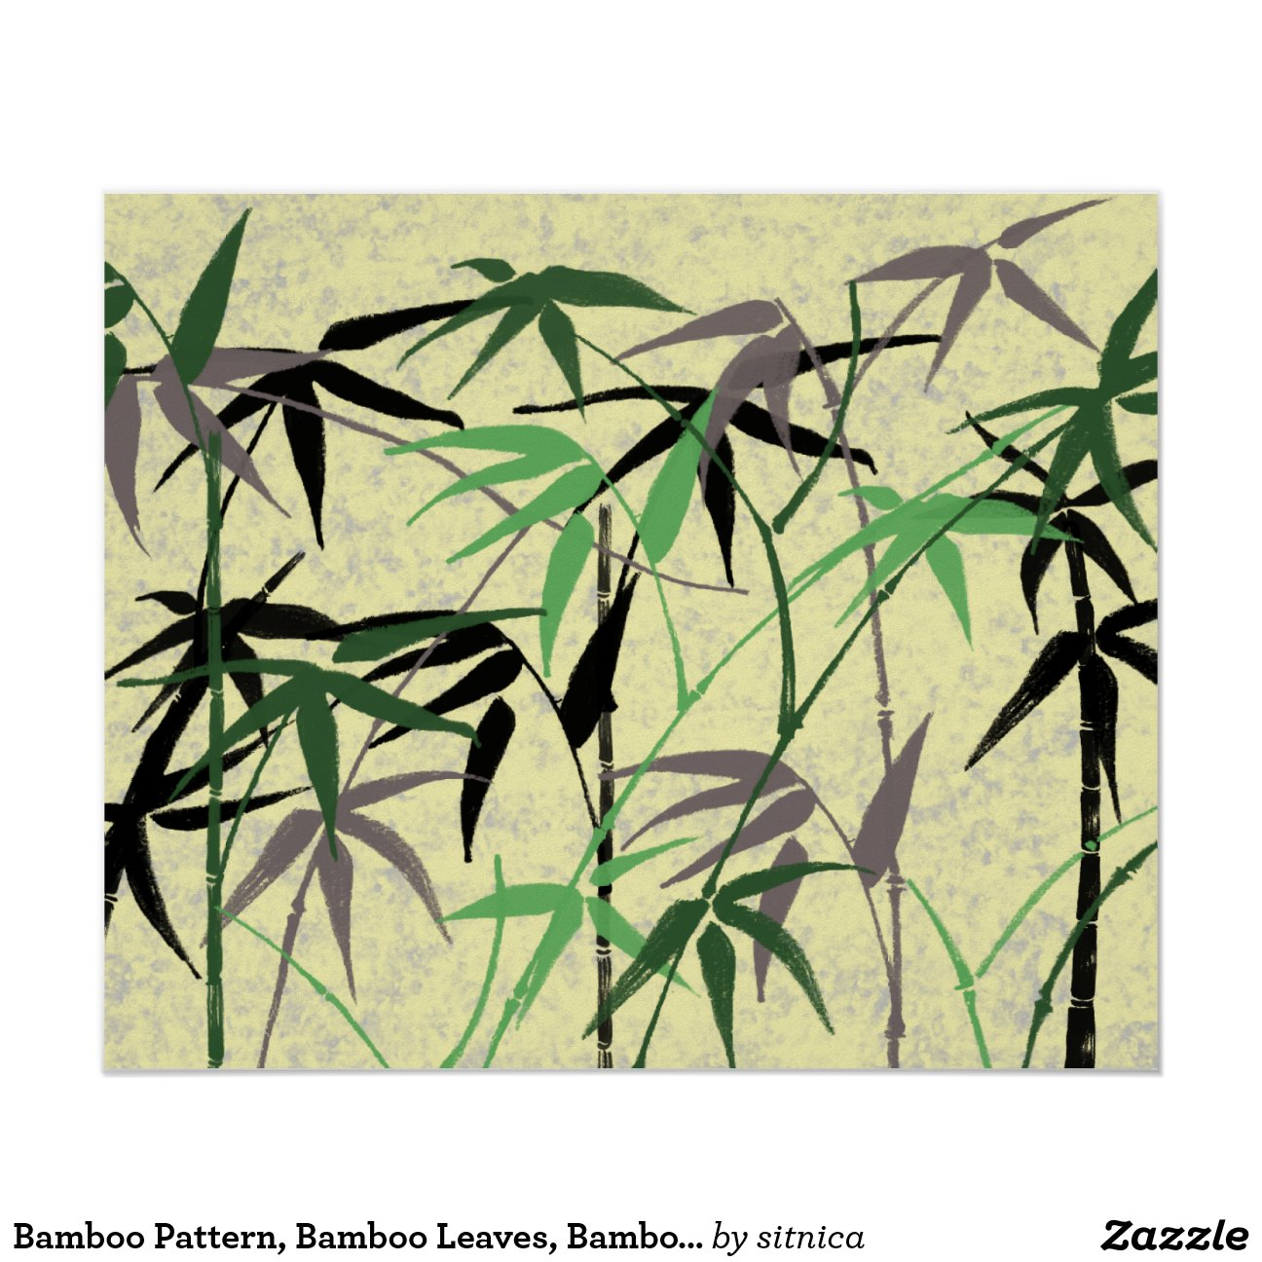 feuillage en bambou tiges feuille jaune vert poster zazzle. Black Bedroom Furniture Sets. Home Design Ideas